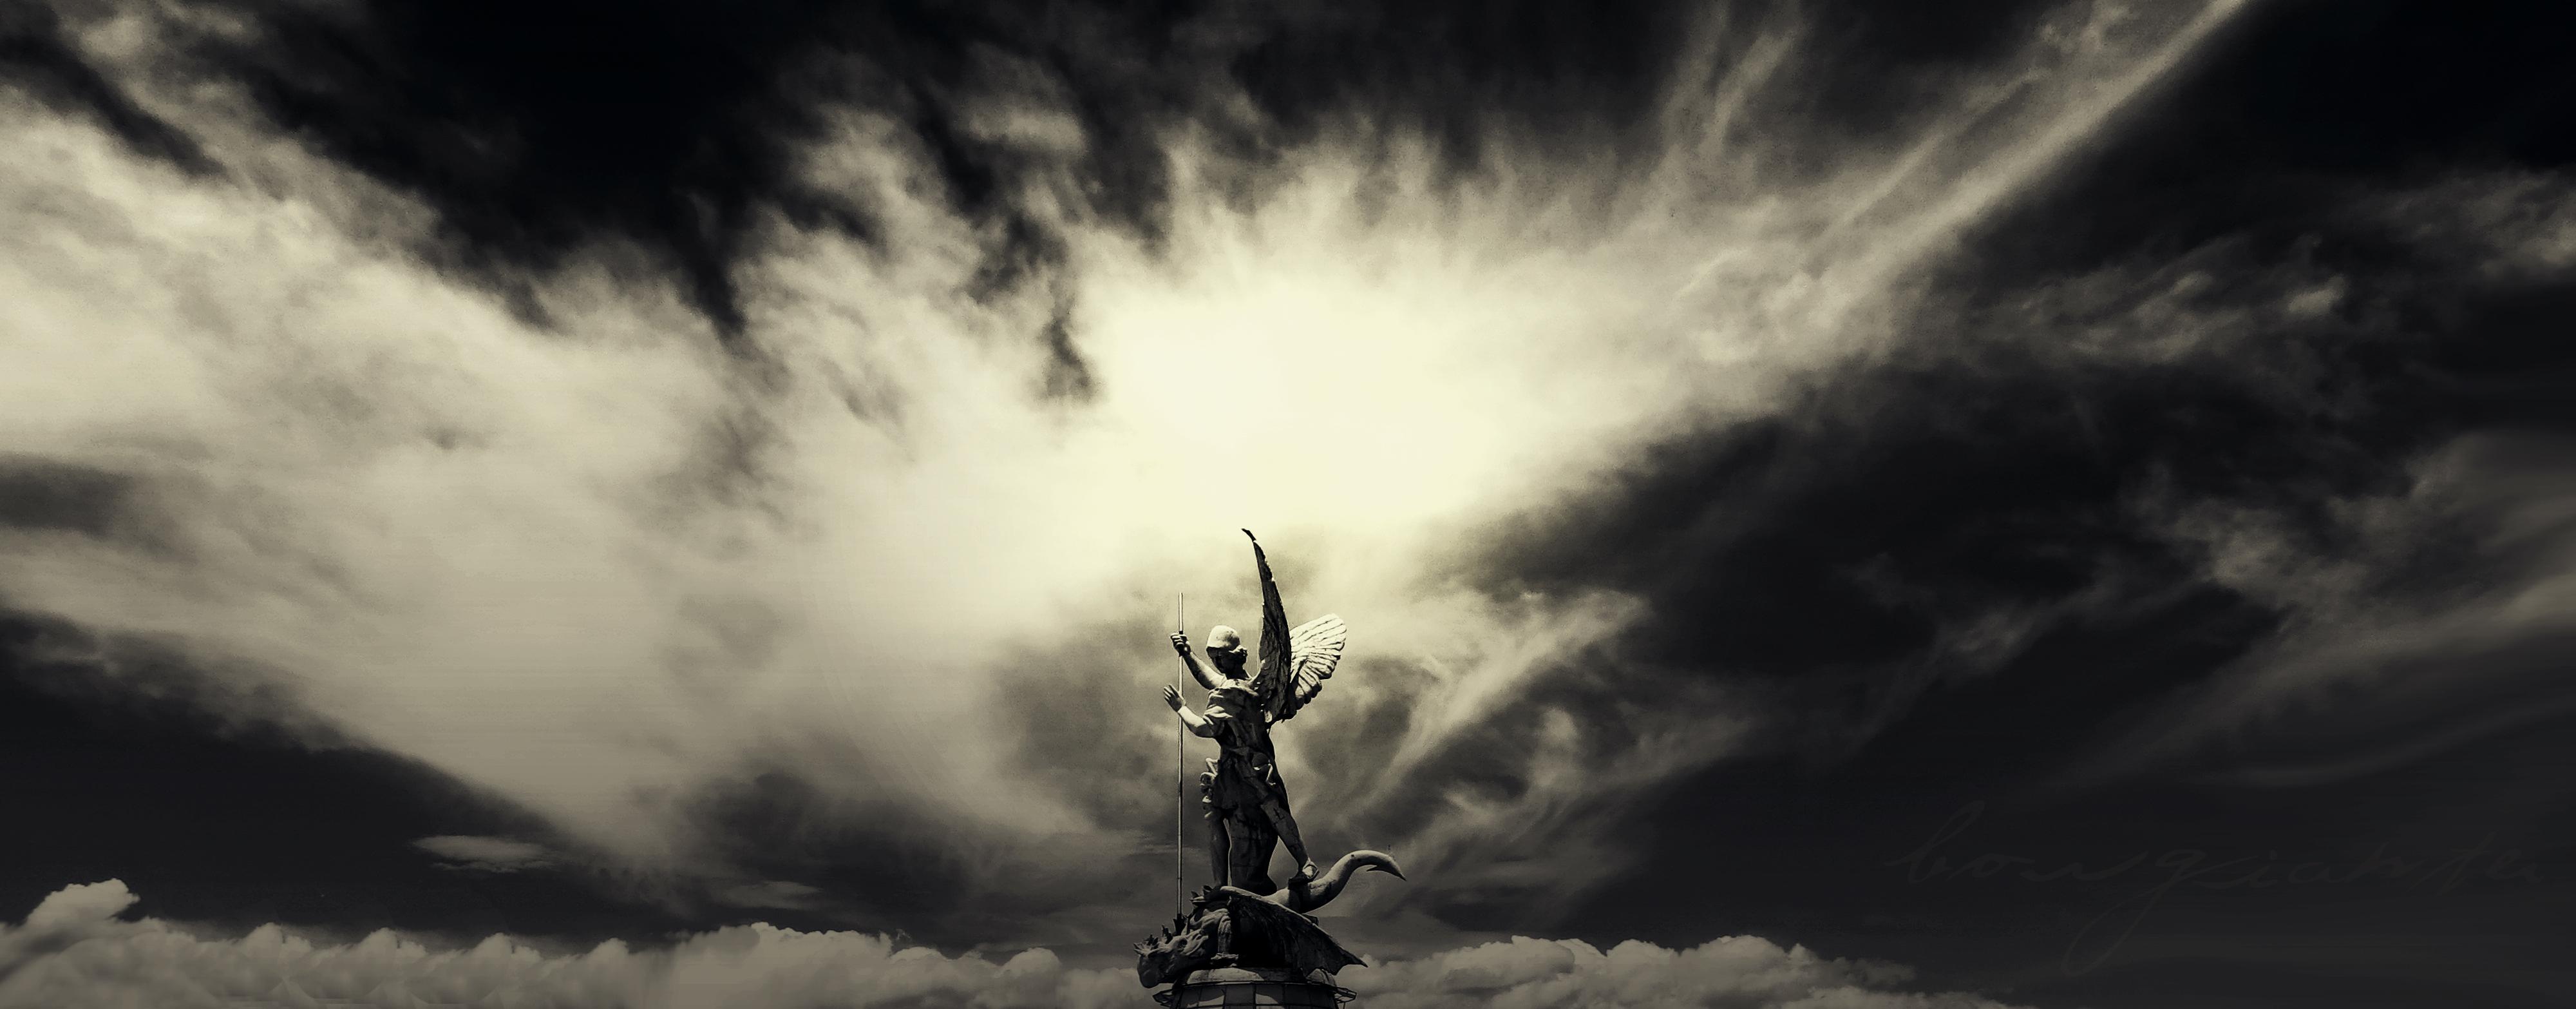 The Power of Light XXII by emmanuelborja